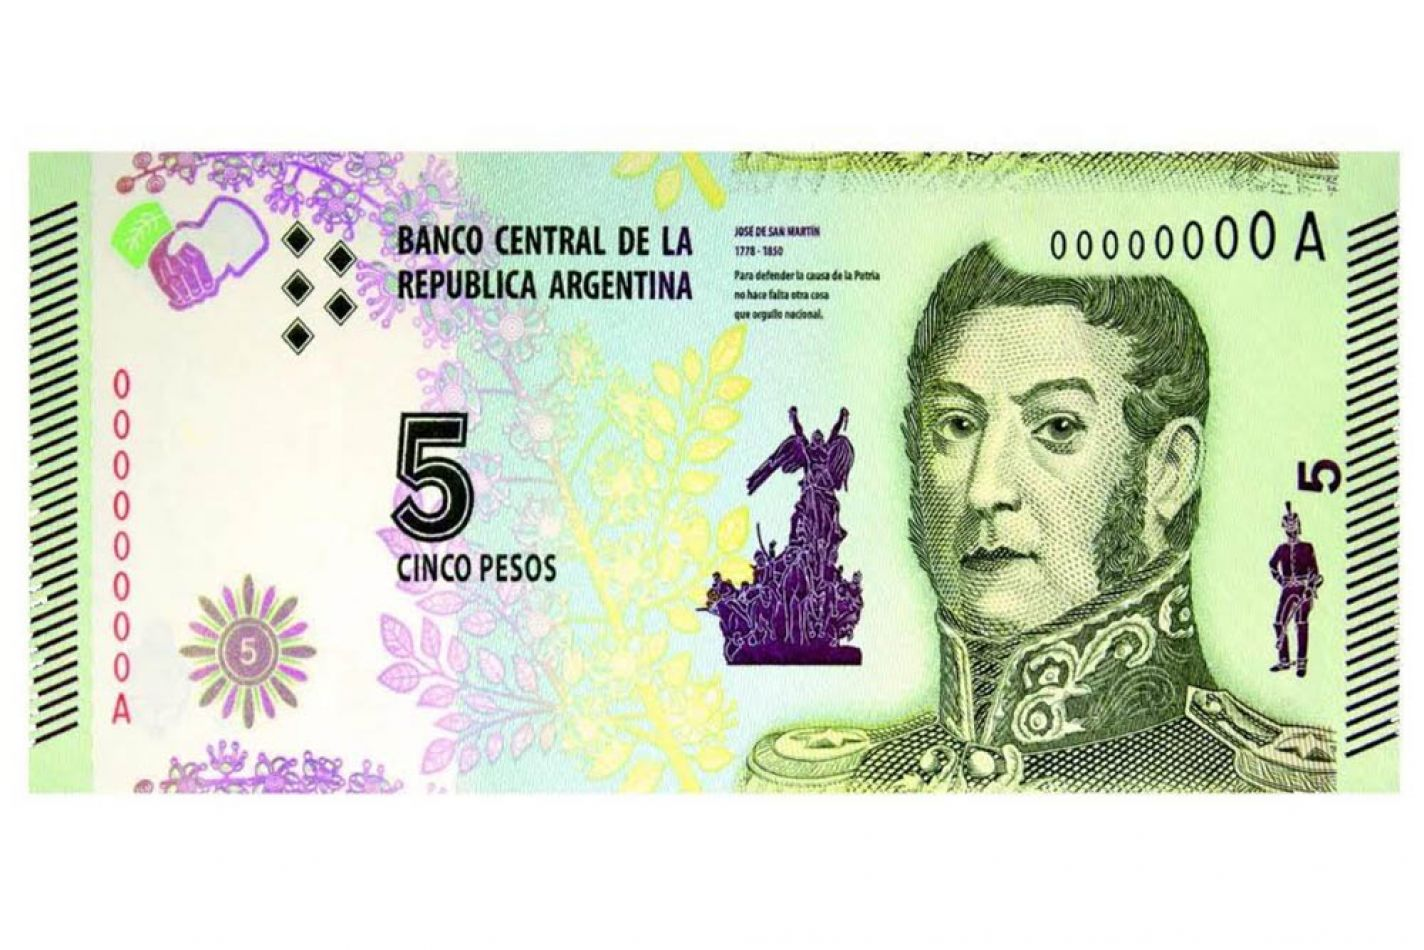 Se estira la vigencia del billete de 5 pesos